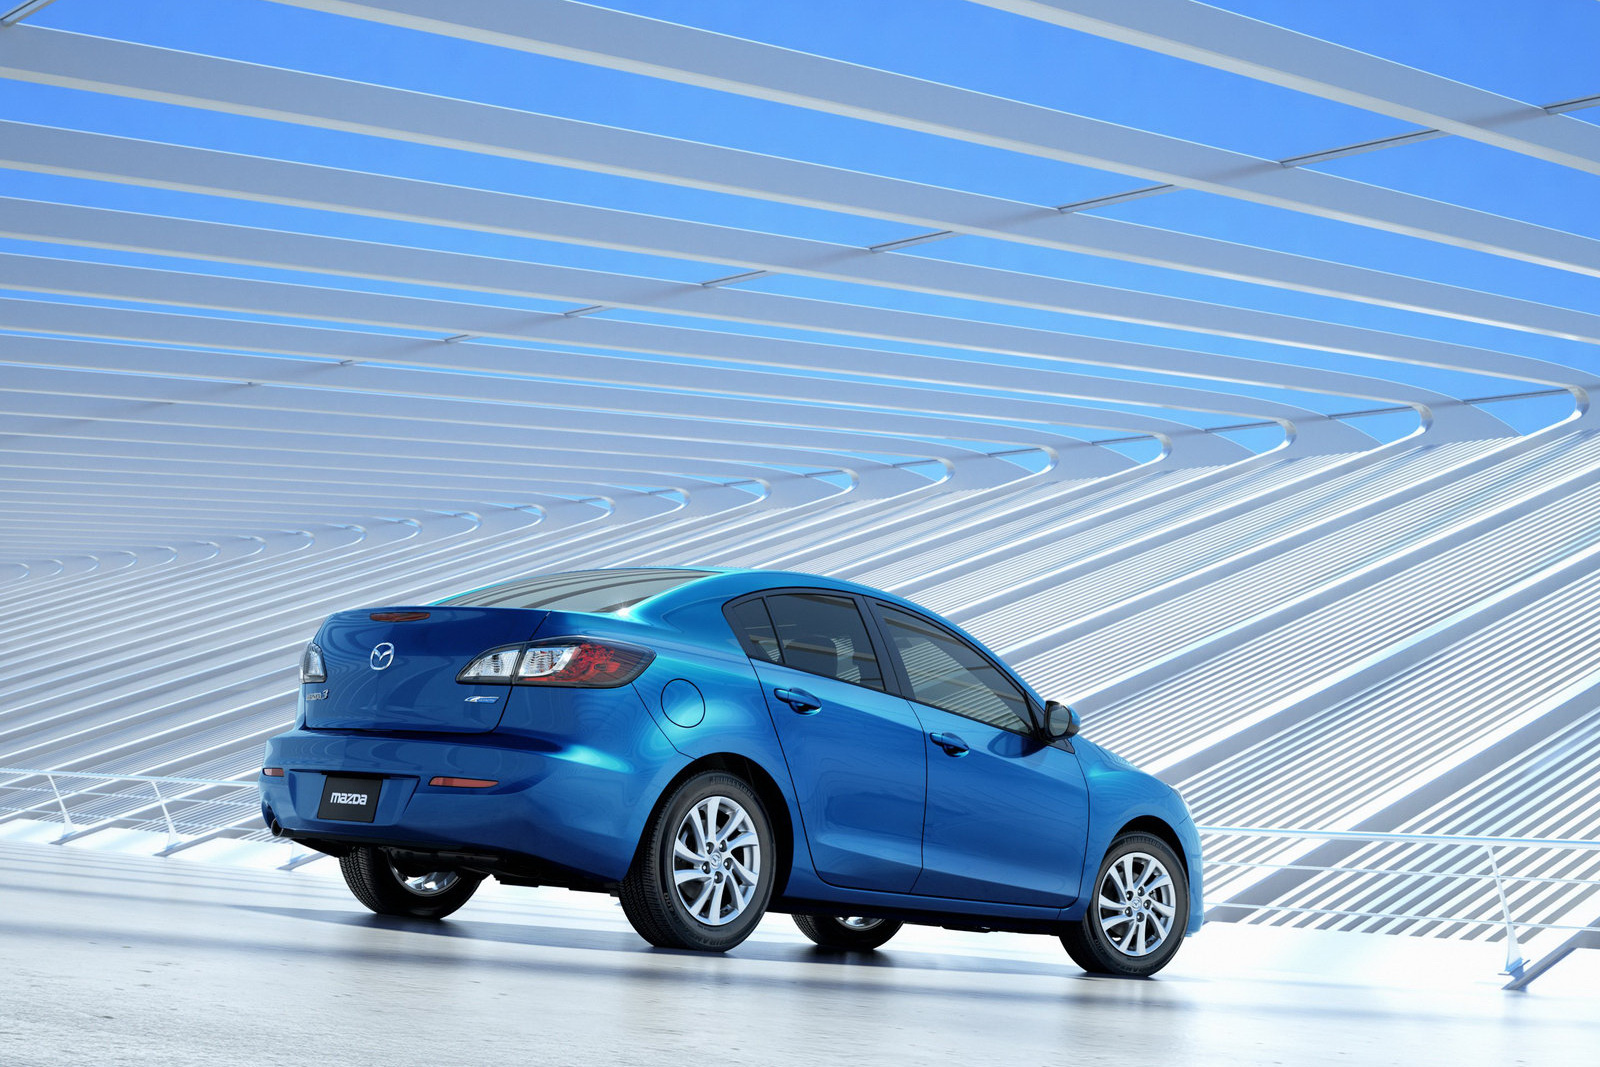 https://ymimg1.b8cdn.com/uploads/car_model/187/pictures/1179/Mazda-3-2012-Rear_View.jpg